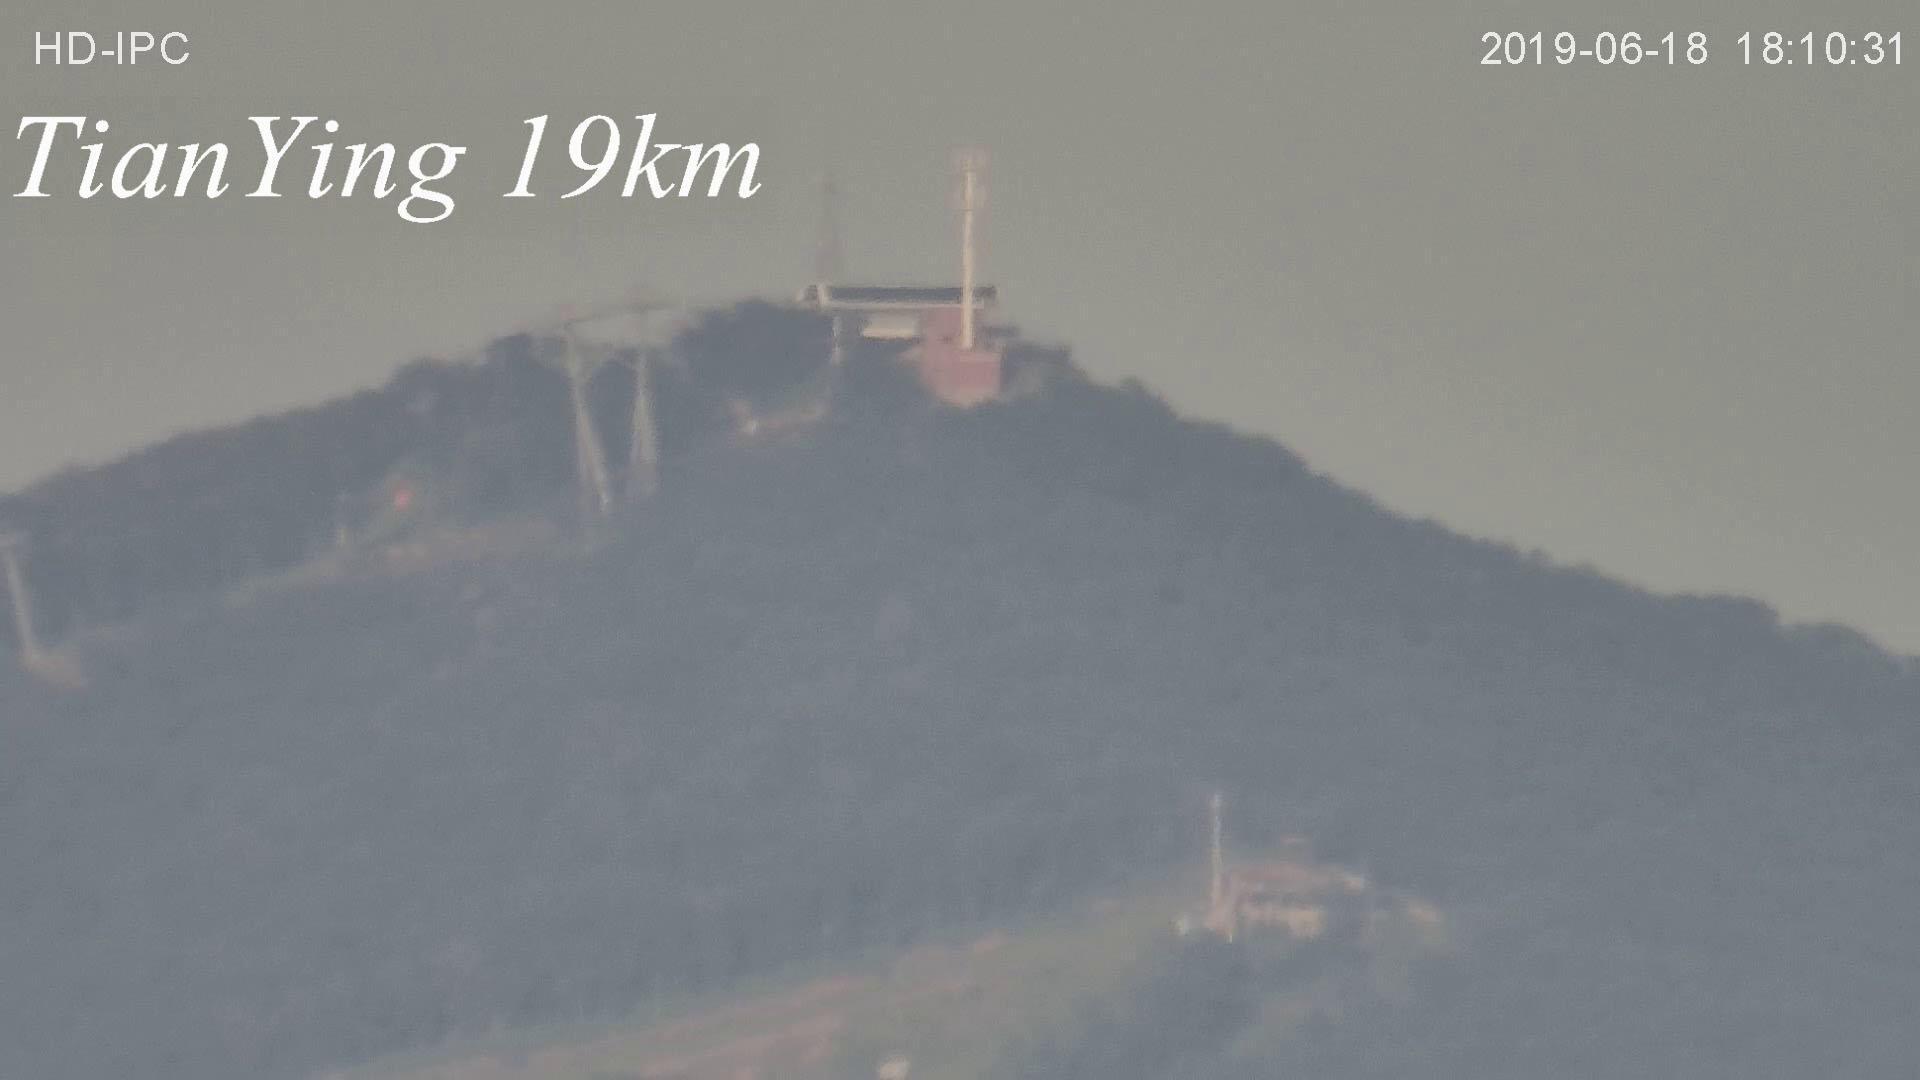 Man 8km+ TV Thermal Camera Laser Rangefinder Auto Tracking Surveillance System 10